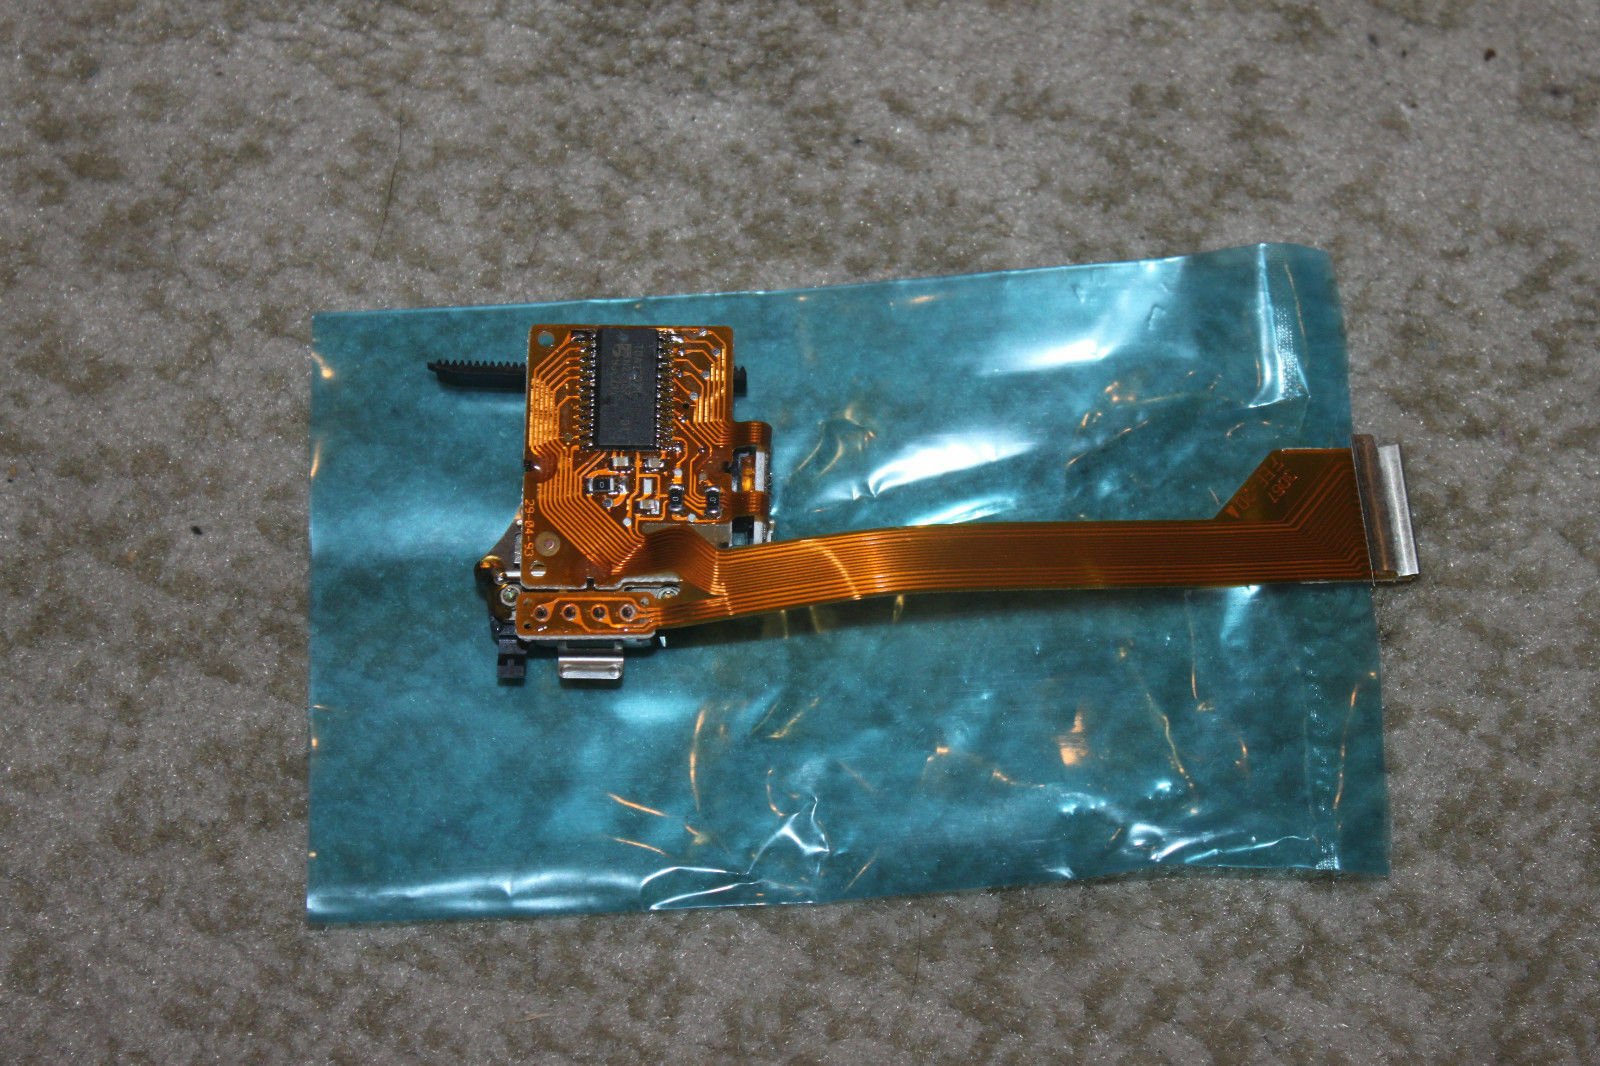 New AMI Rowe Rockola Jukebox Philips CDM12 CD Pro Player Opt